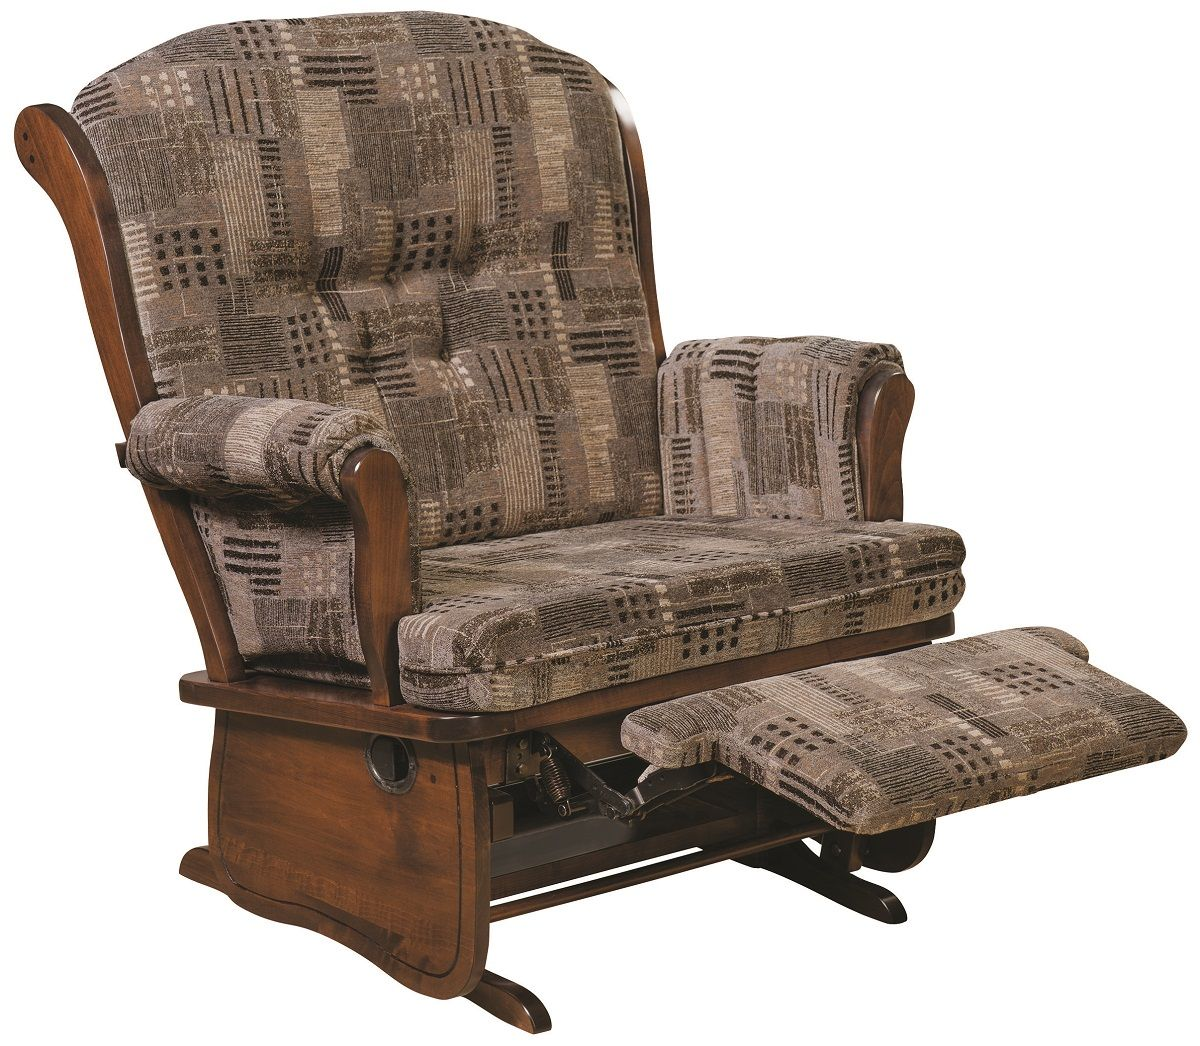 Keyport Hardwood Chair and a Half